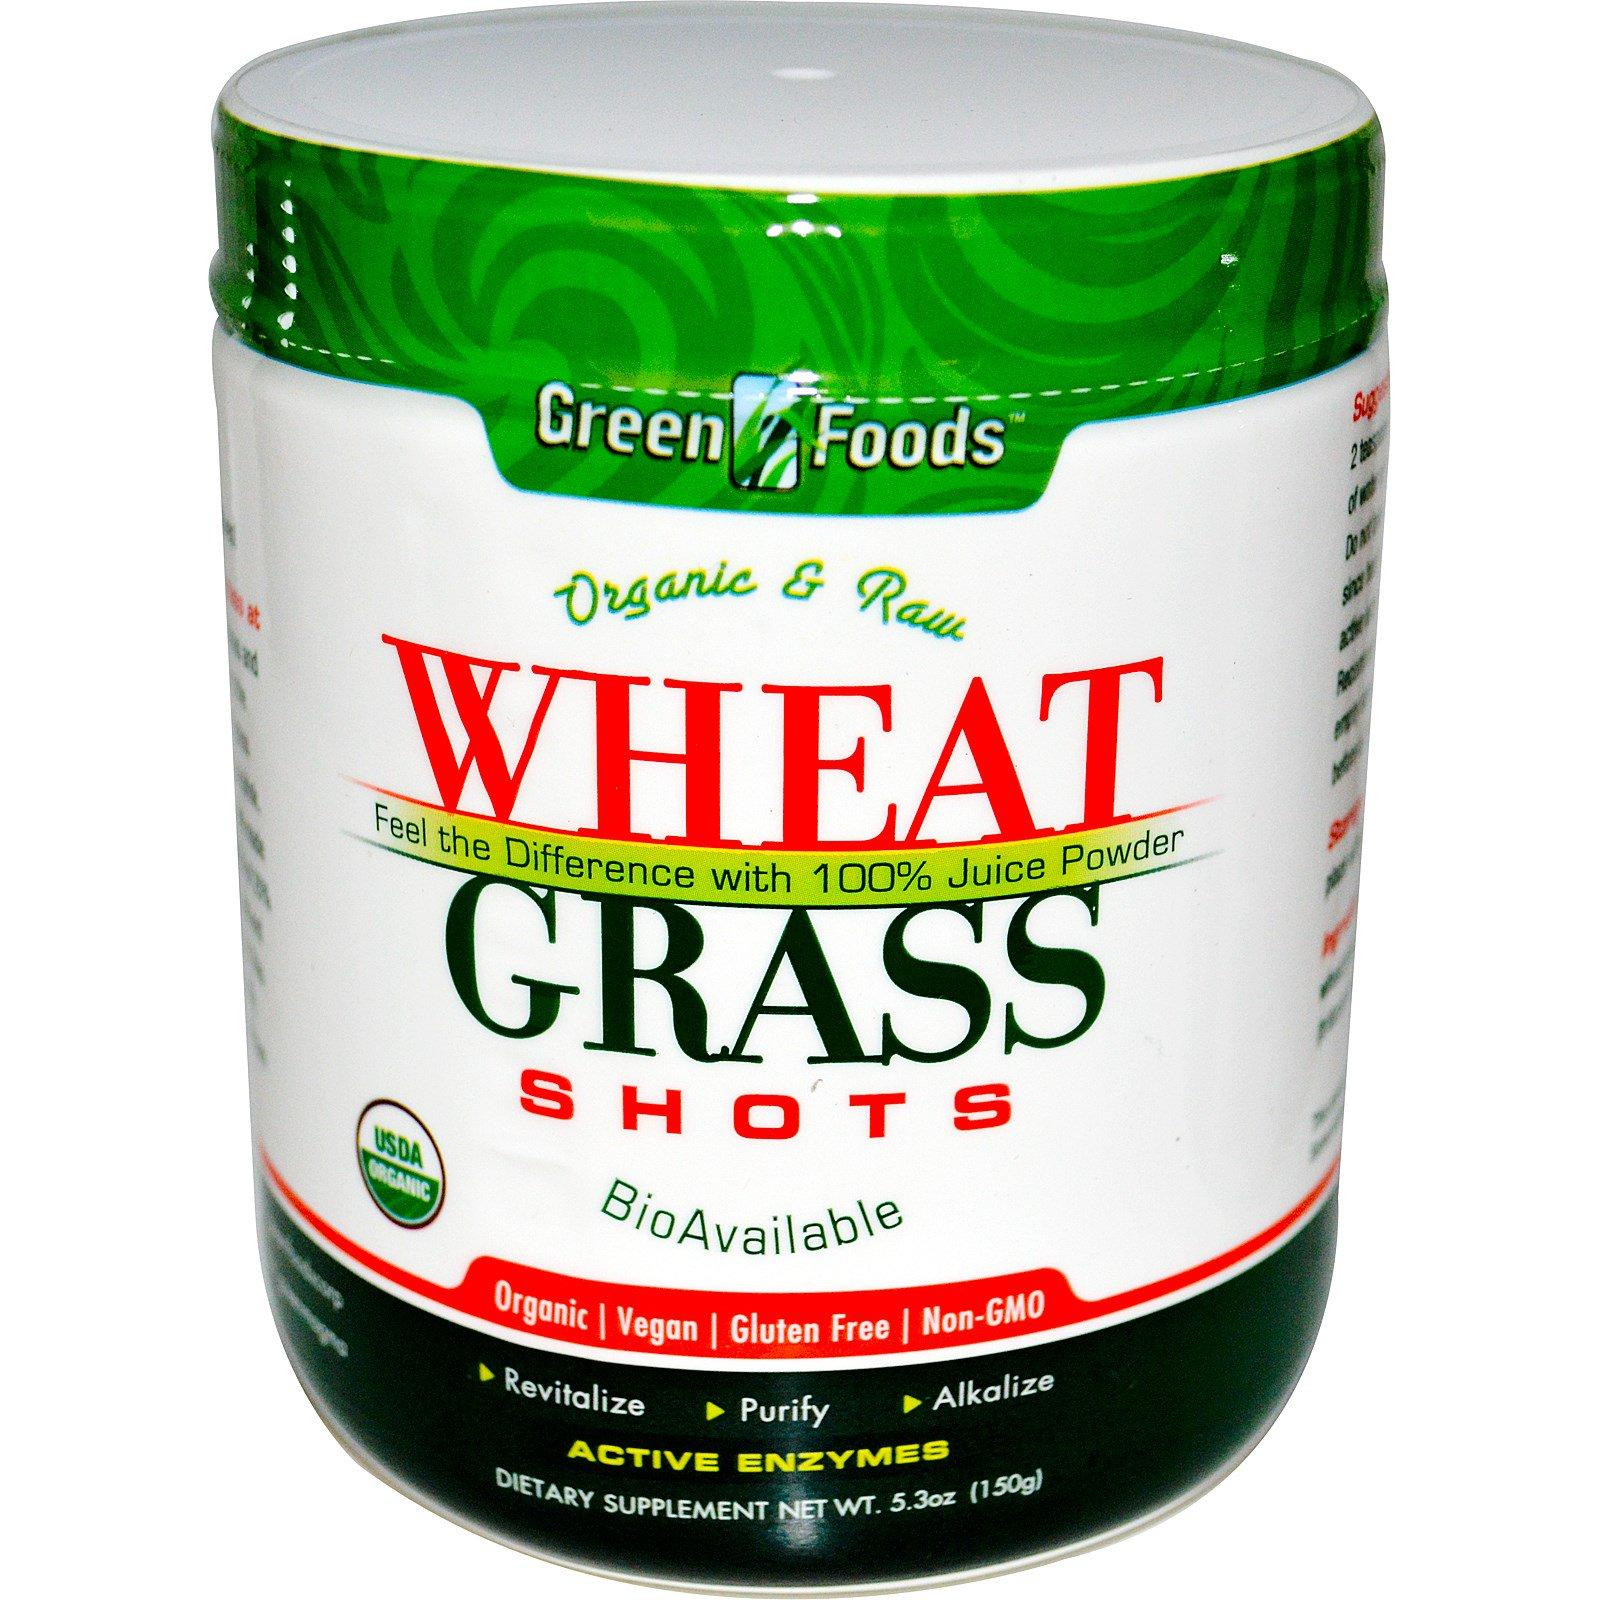 Green Foods Corporation Organic Raw Wheat Grass Shots 53 Oz Supergreen Food 150 Tablets Sgf G